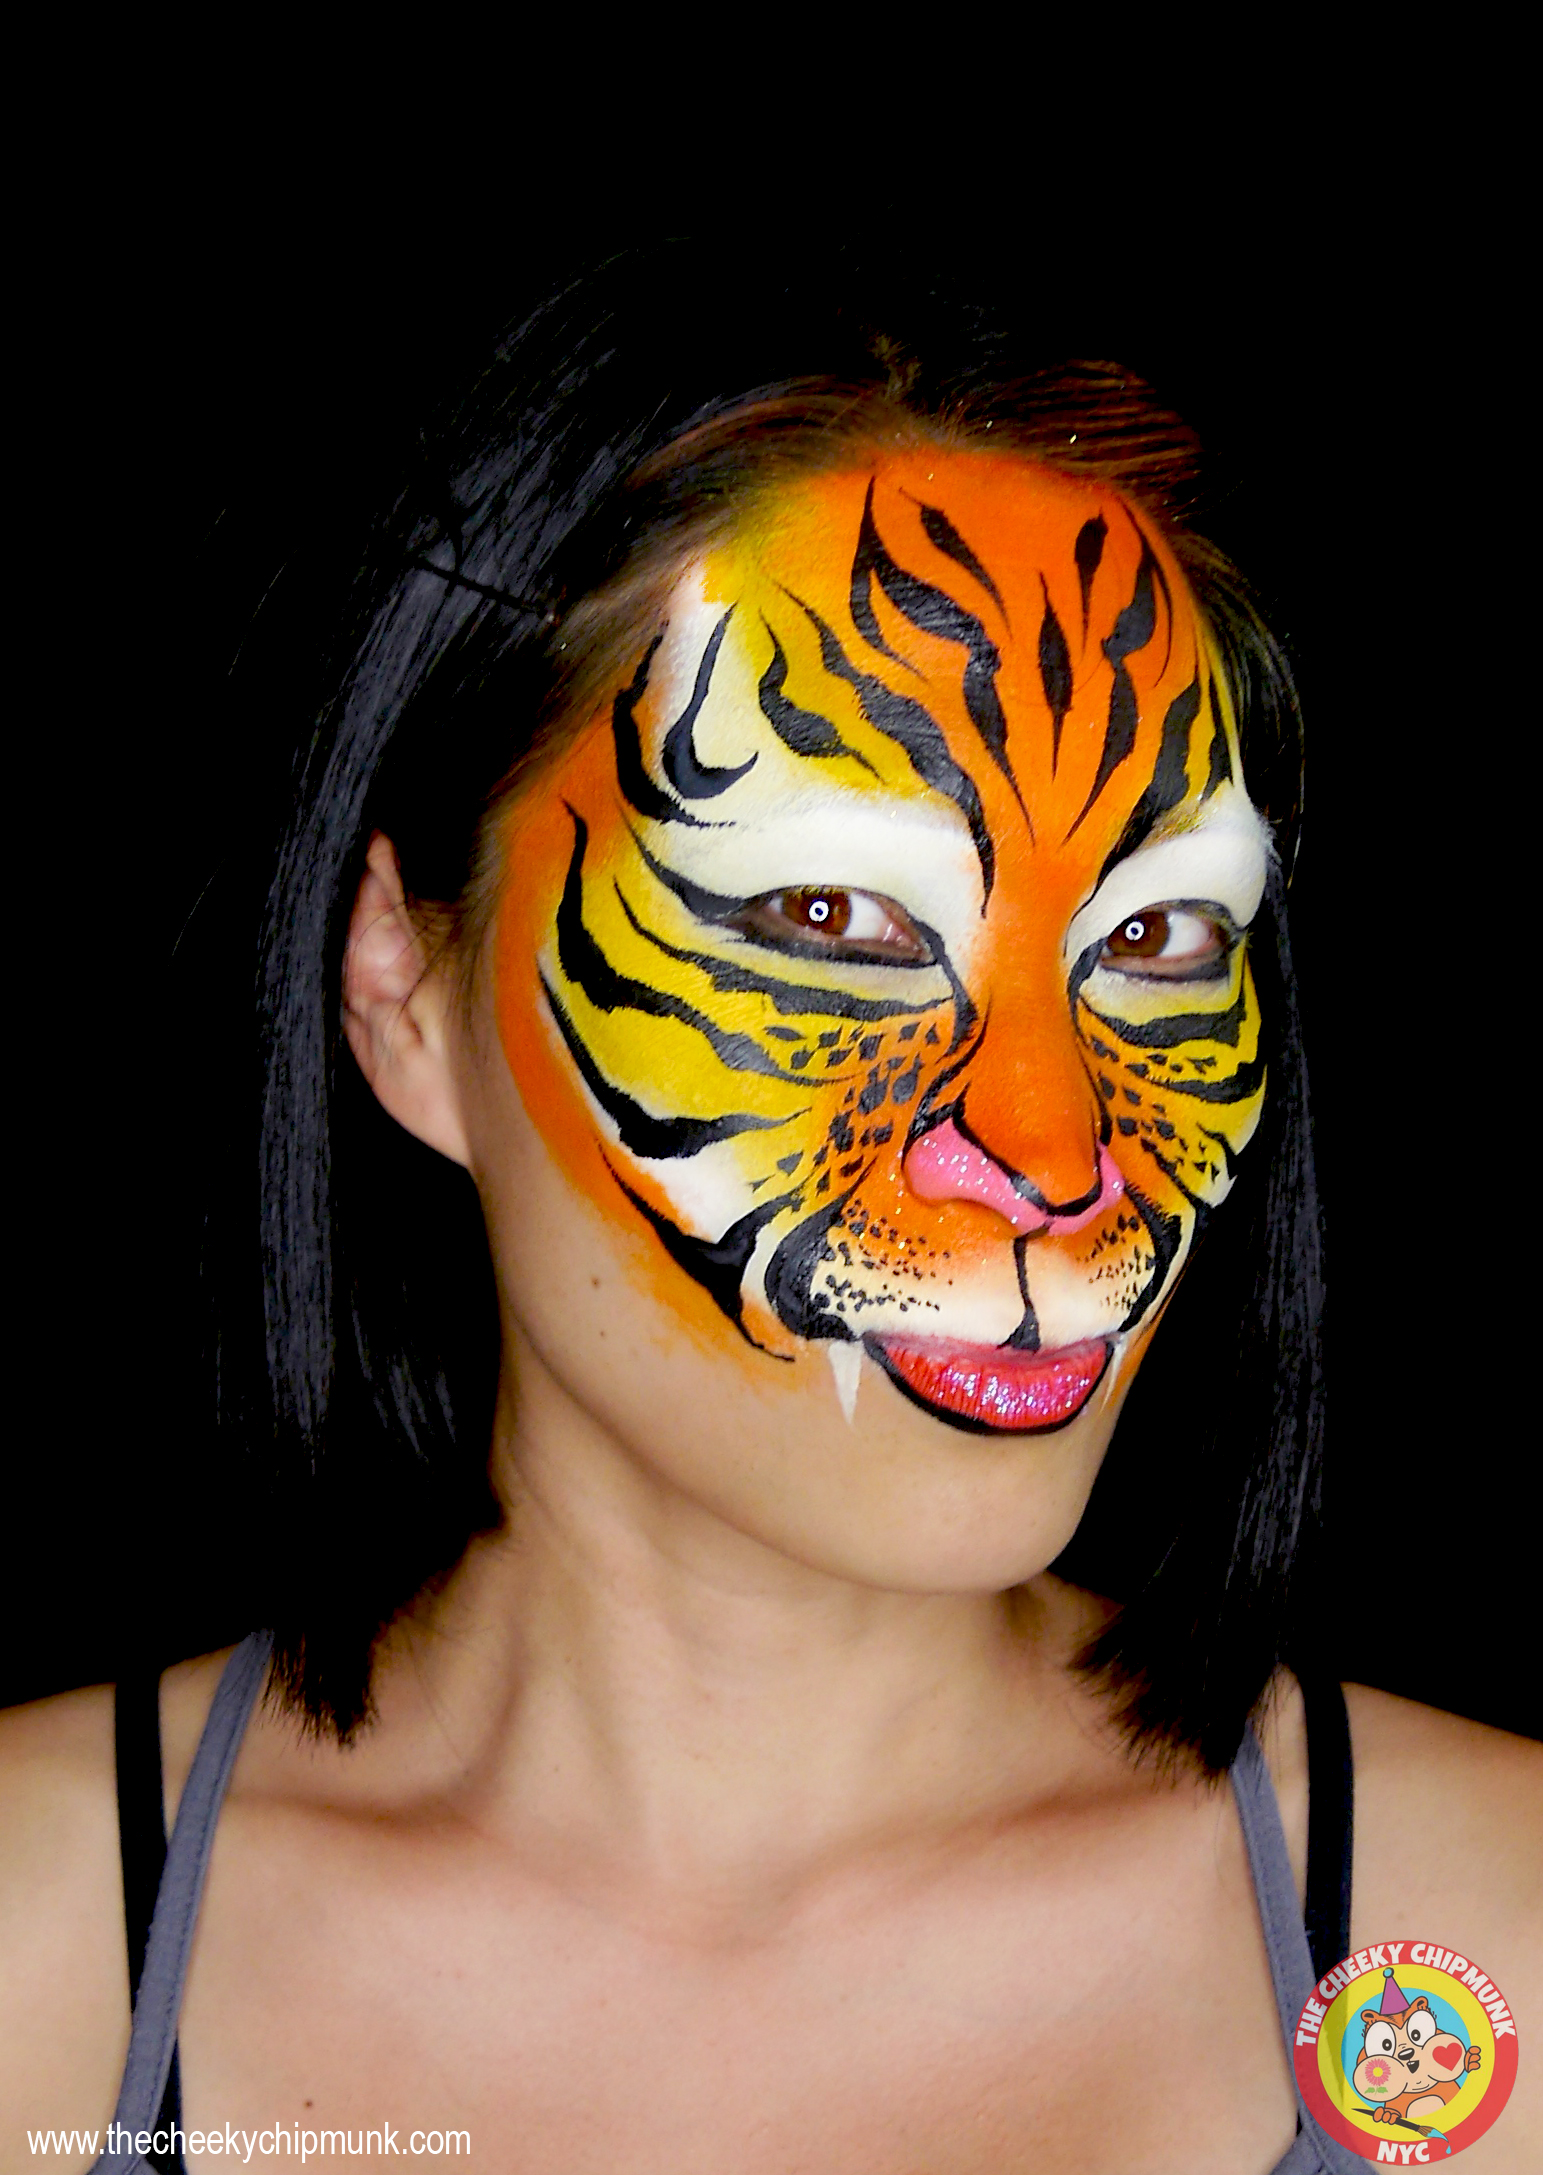 cindy tiger.jpg